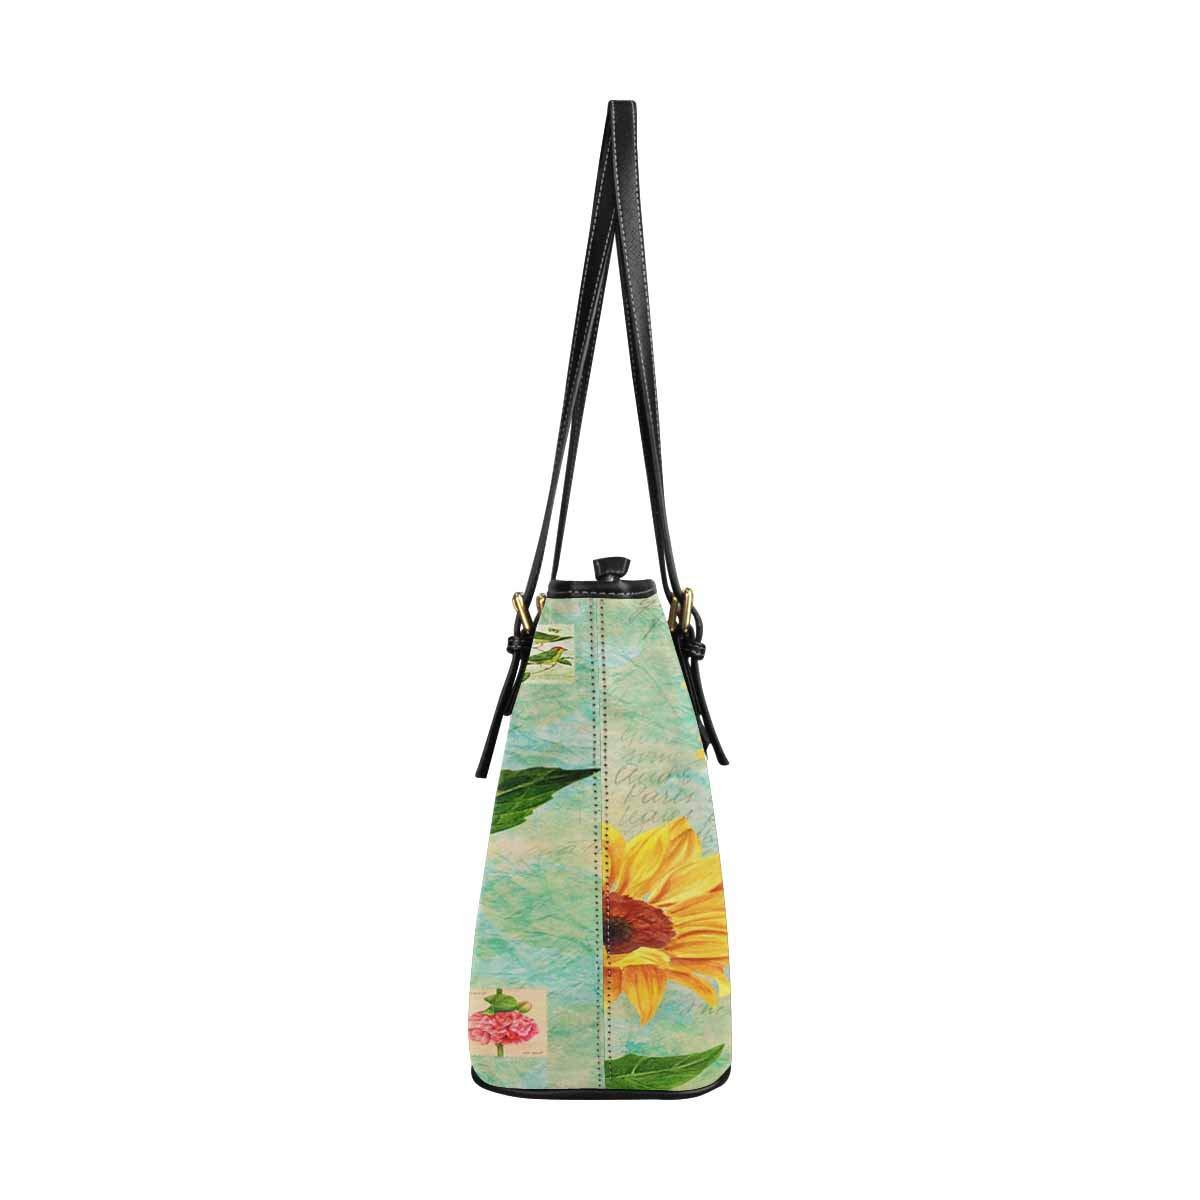 InterestPrint Top Handle Satchel HandBags Shoulder Bags Tote Bags Purse Golden Yellow Watercolor